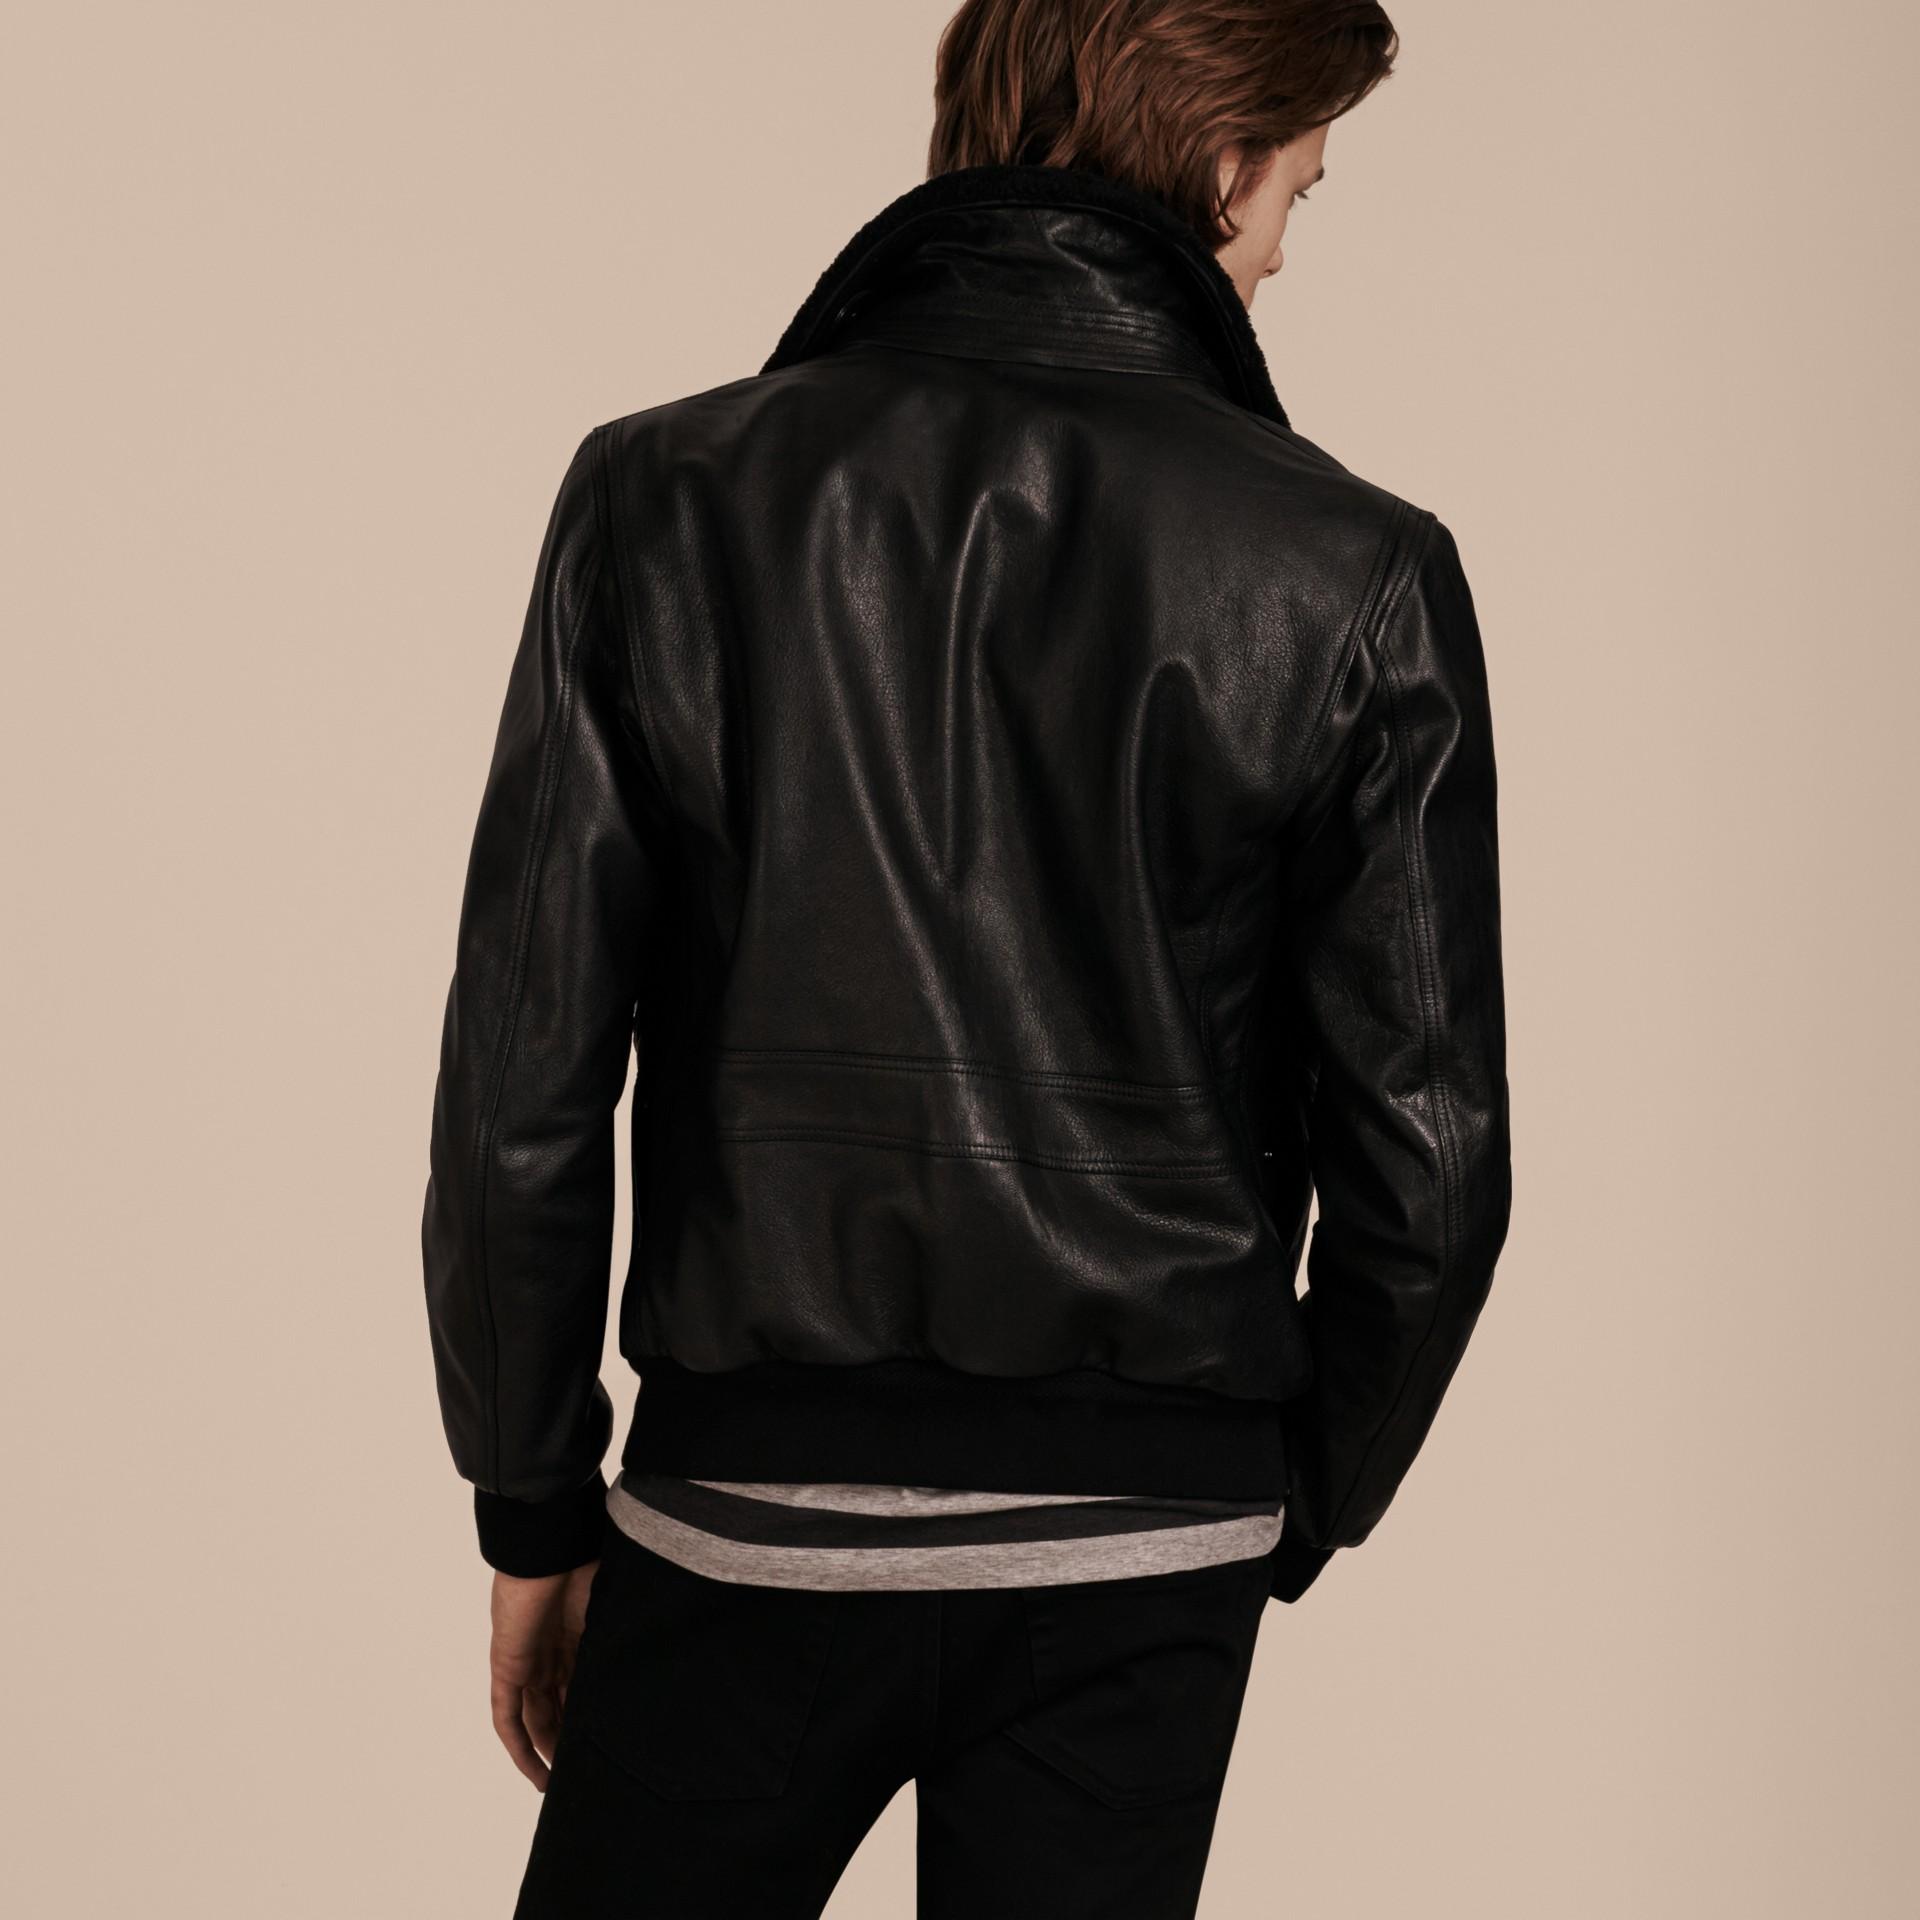 Noir Veste en cuir avec col en shearling amovible - photo de la galerie 3